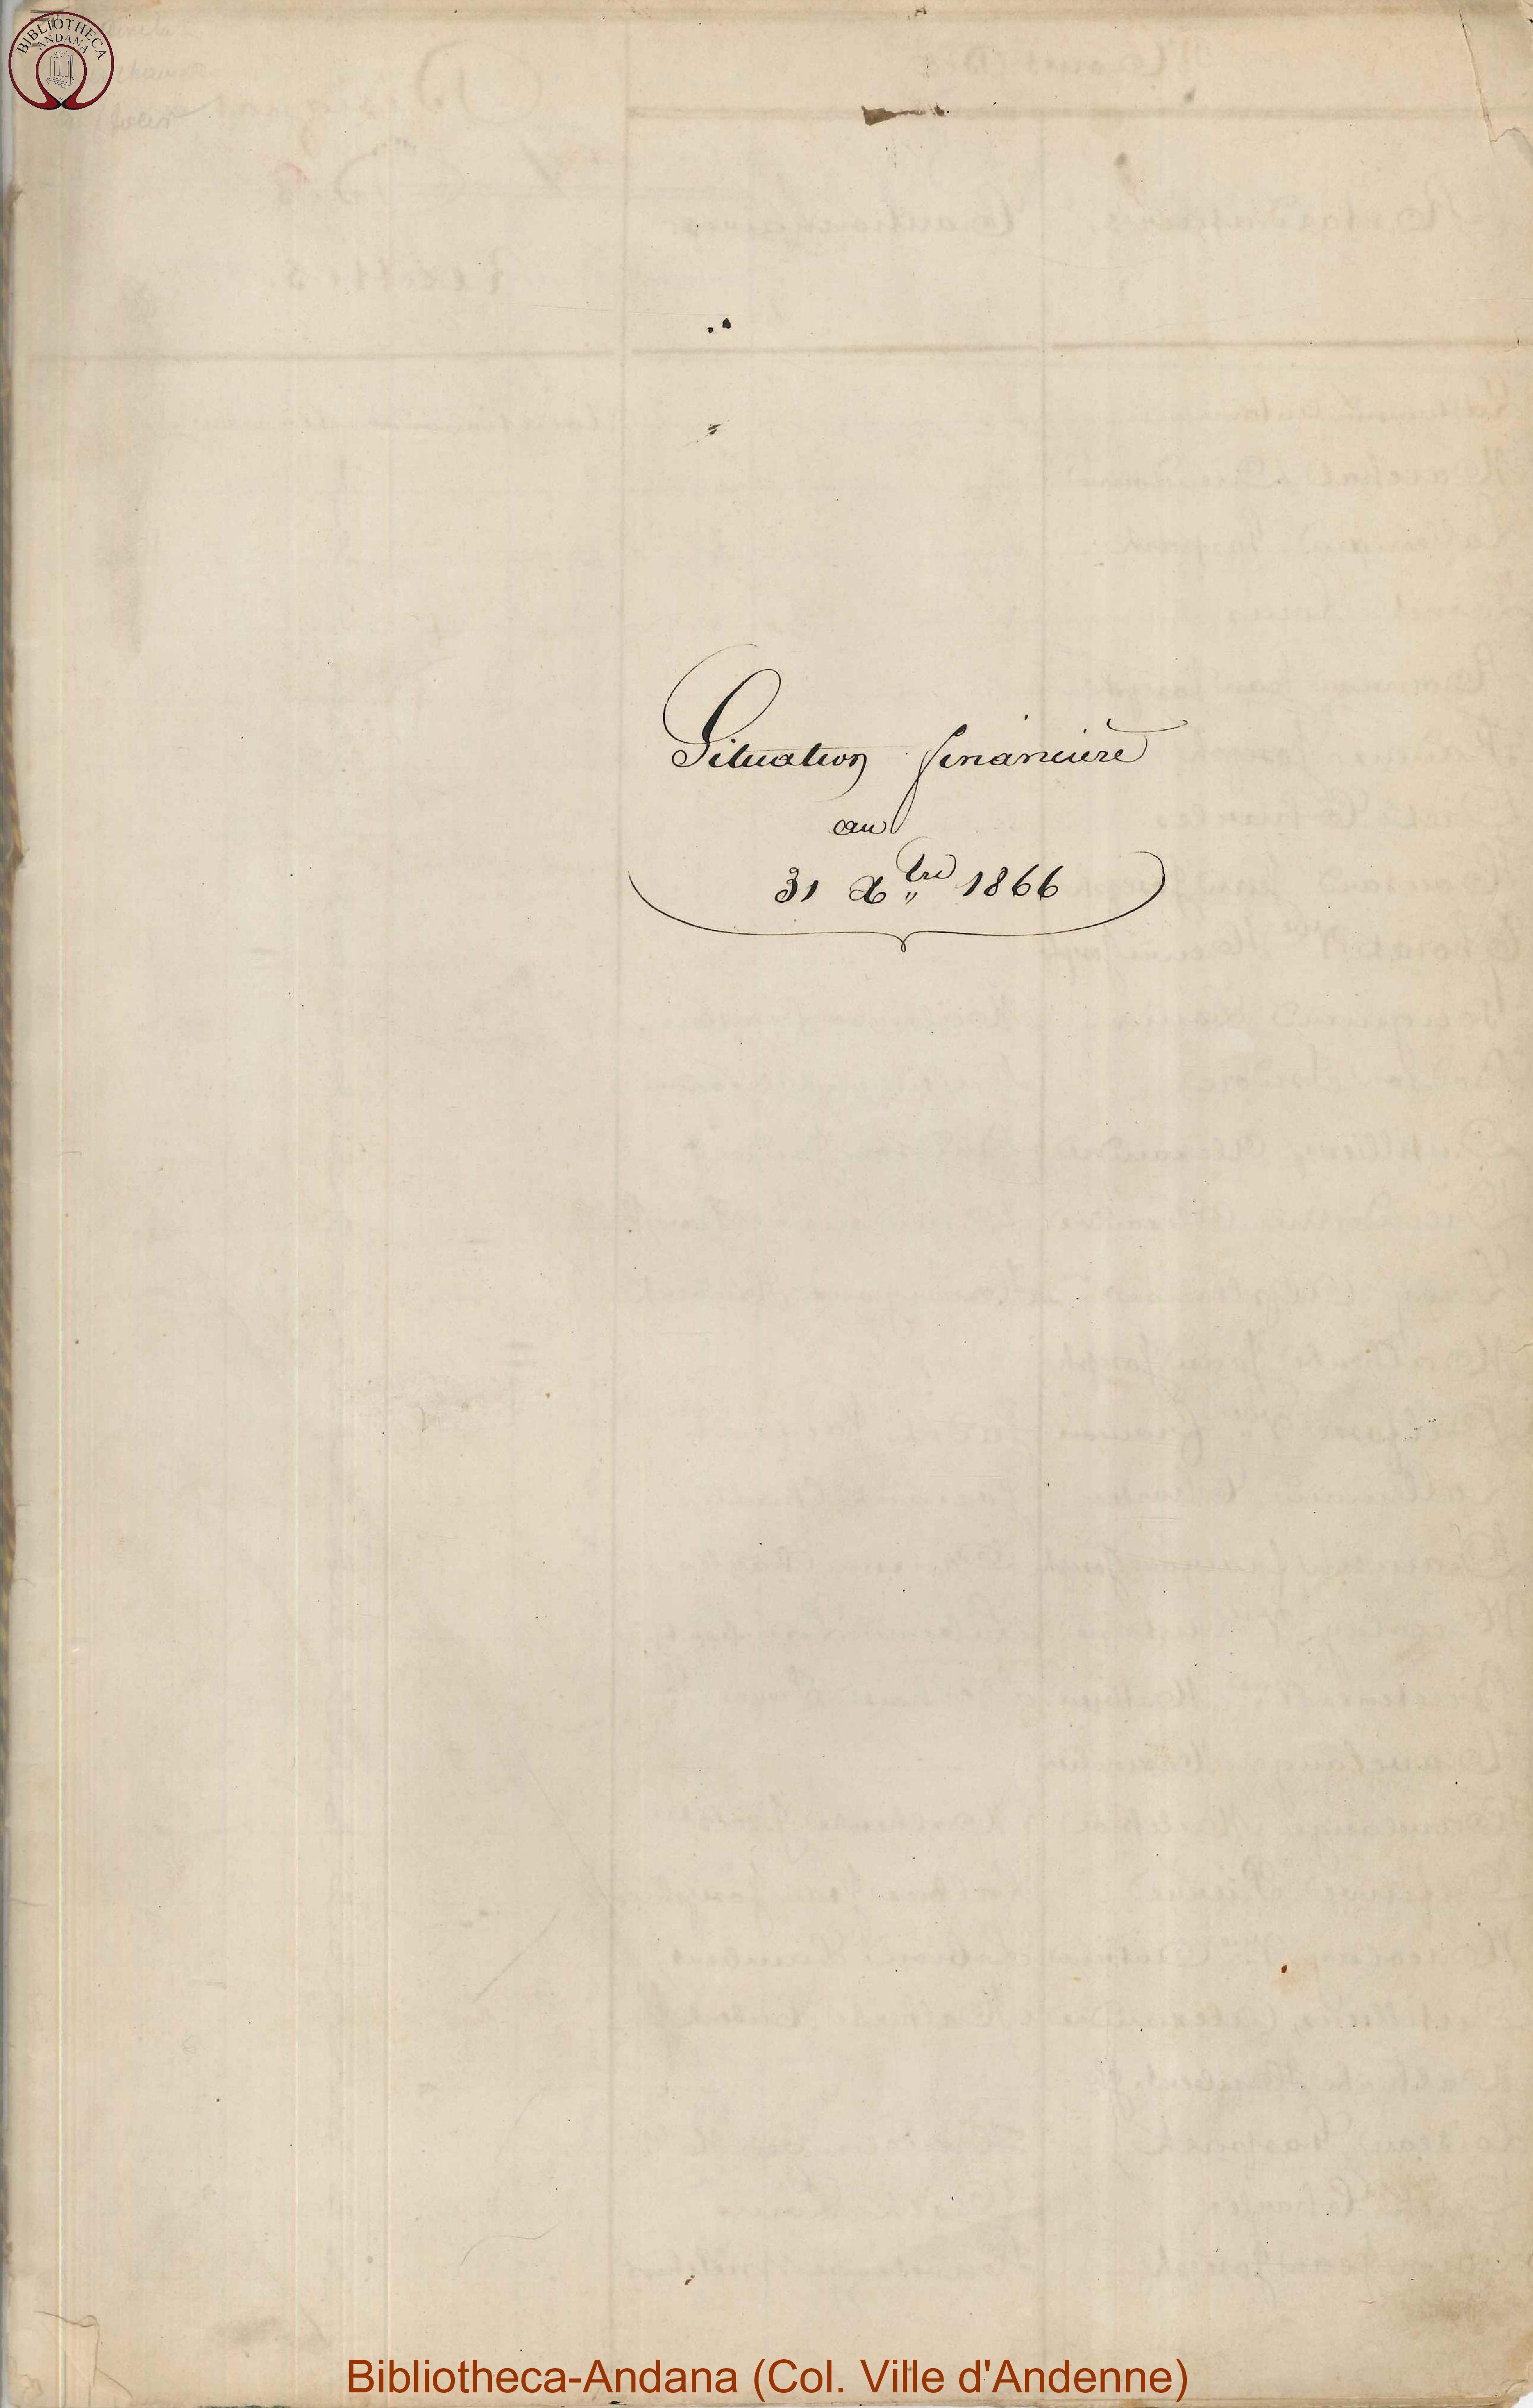 1866-12-31